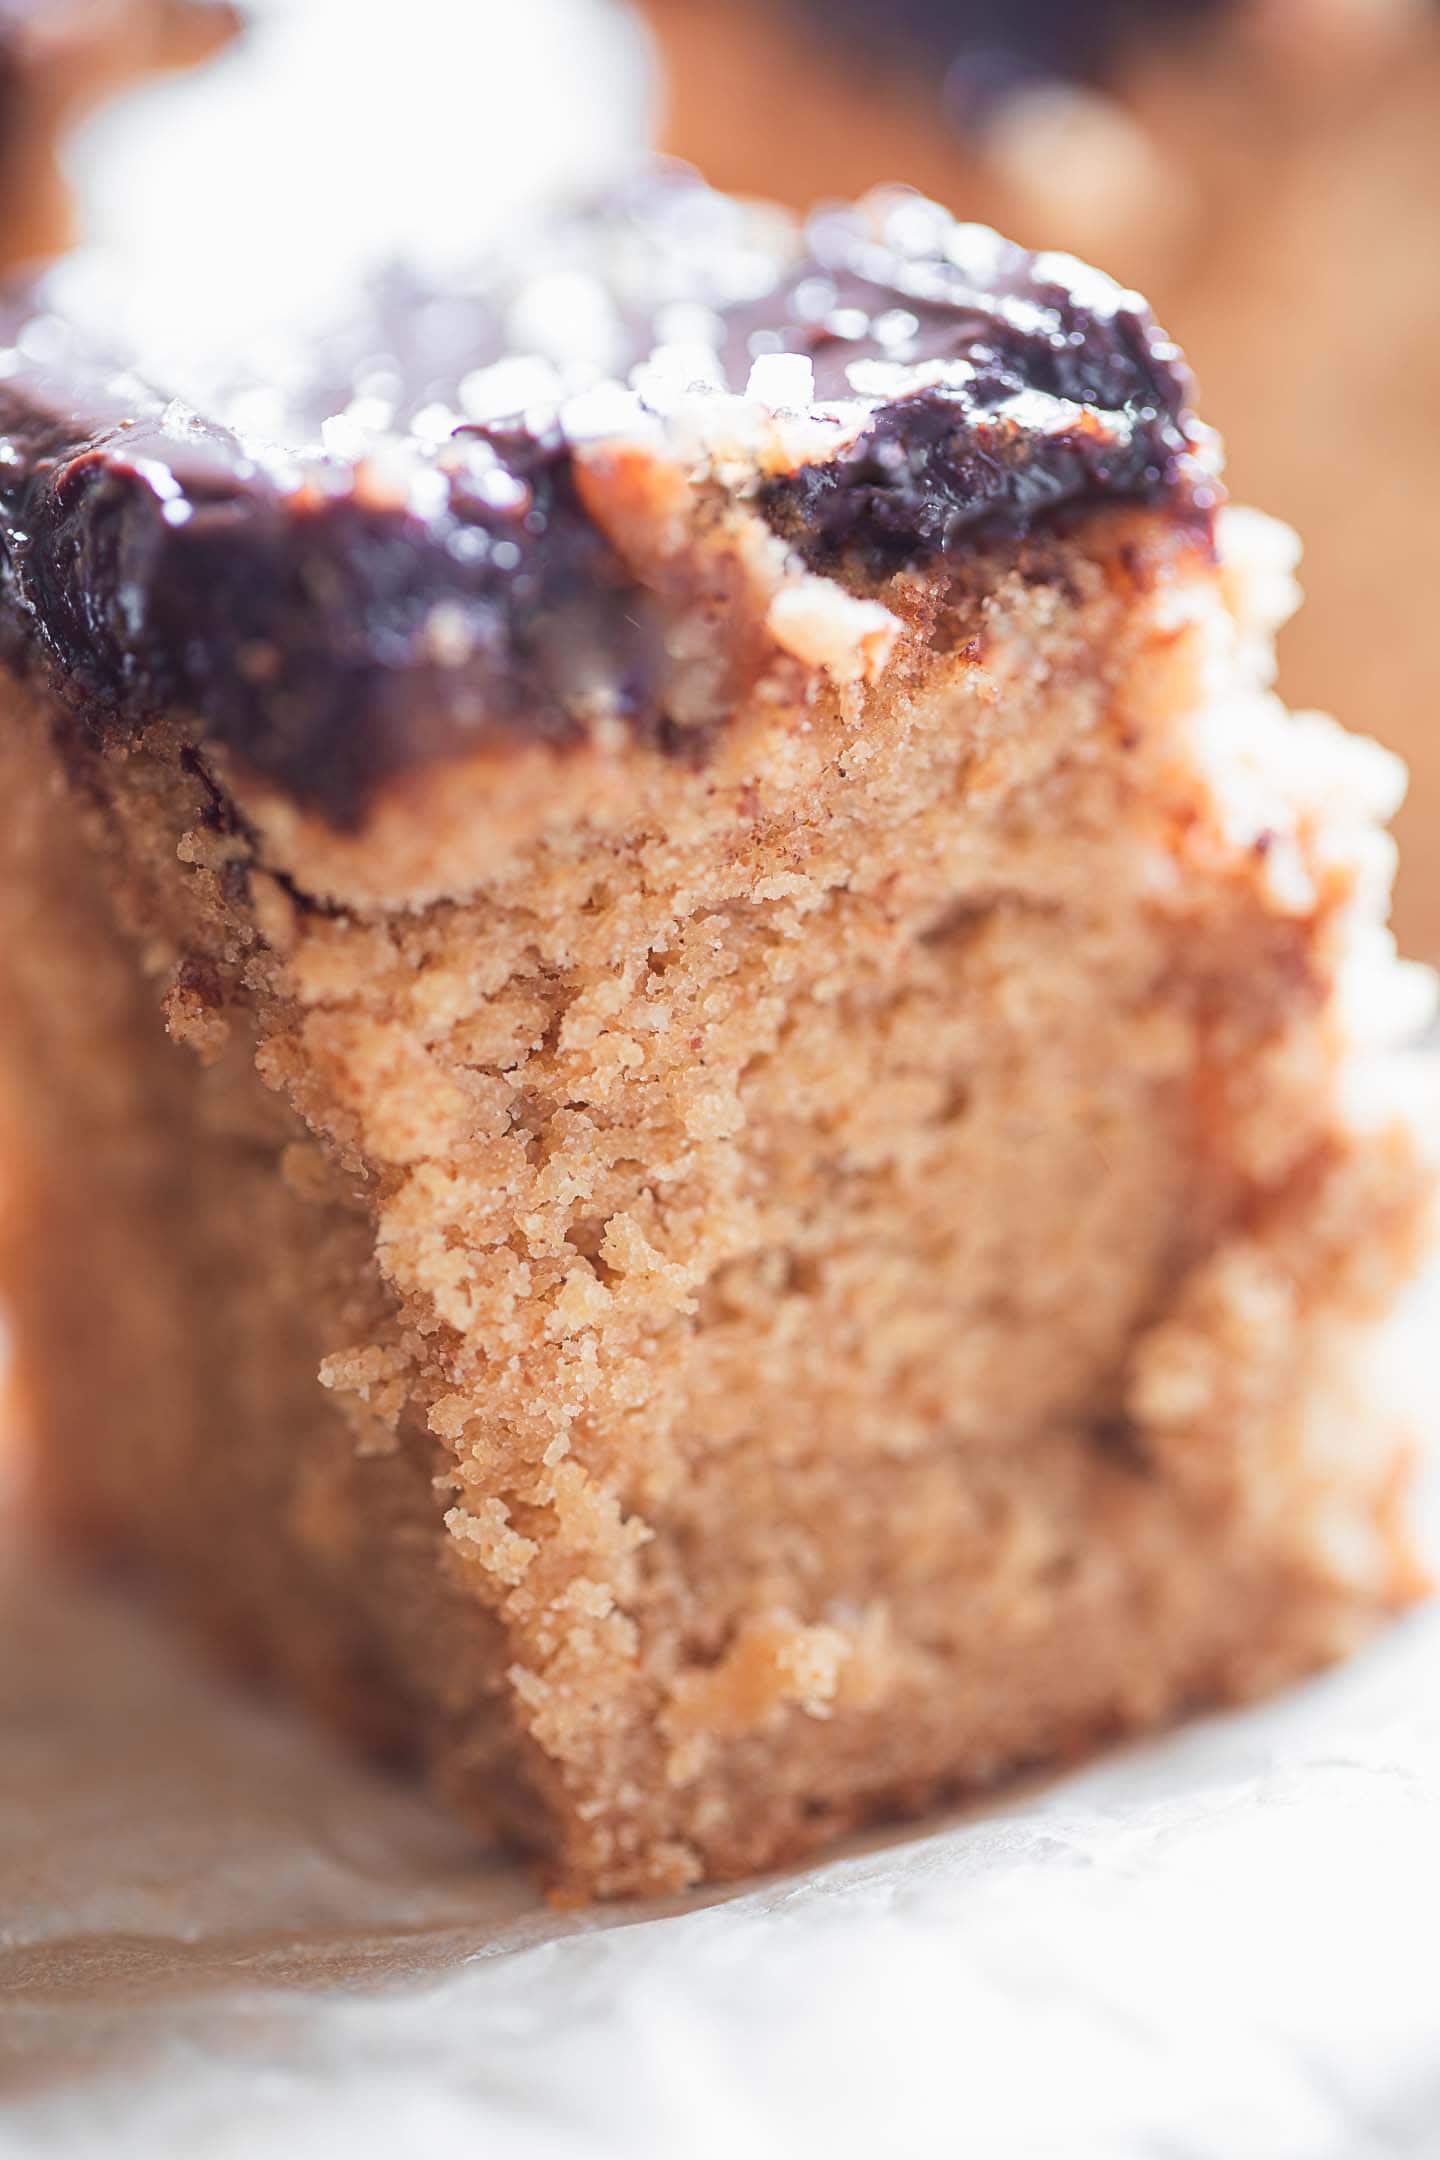 Closeup of vegan peanut butter cake